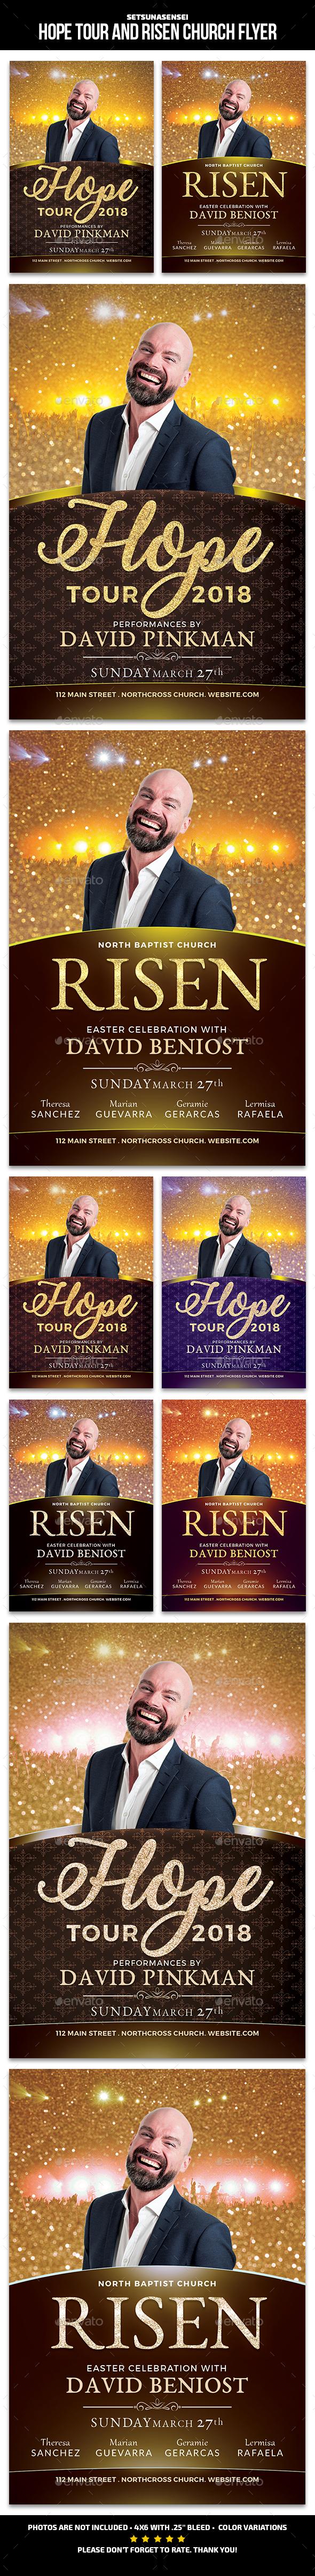 Hope Tour Church Flyer - Church Flyers